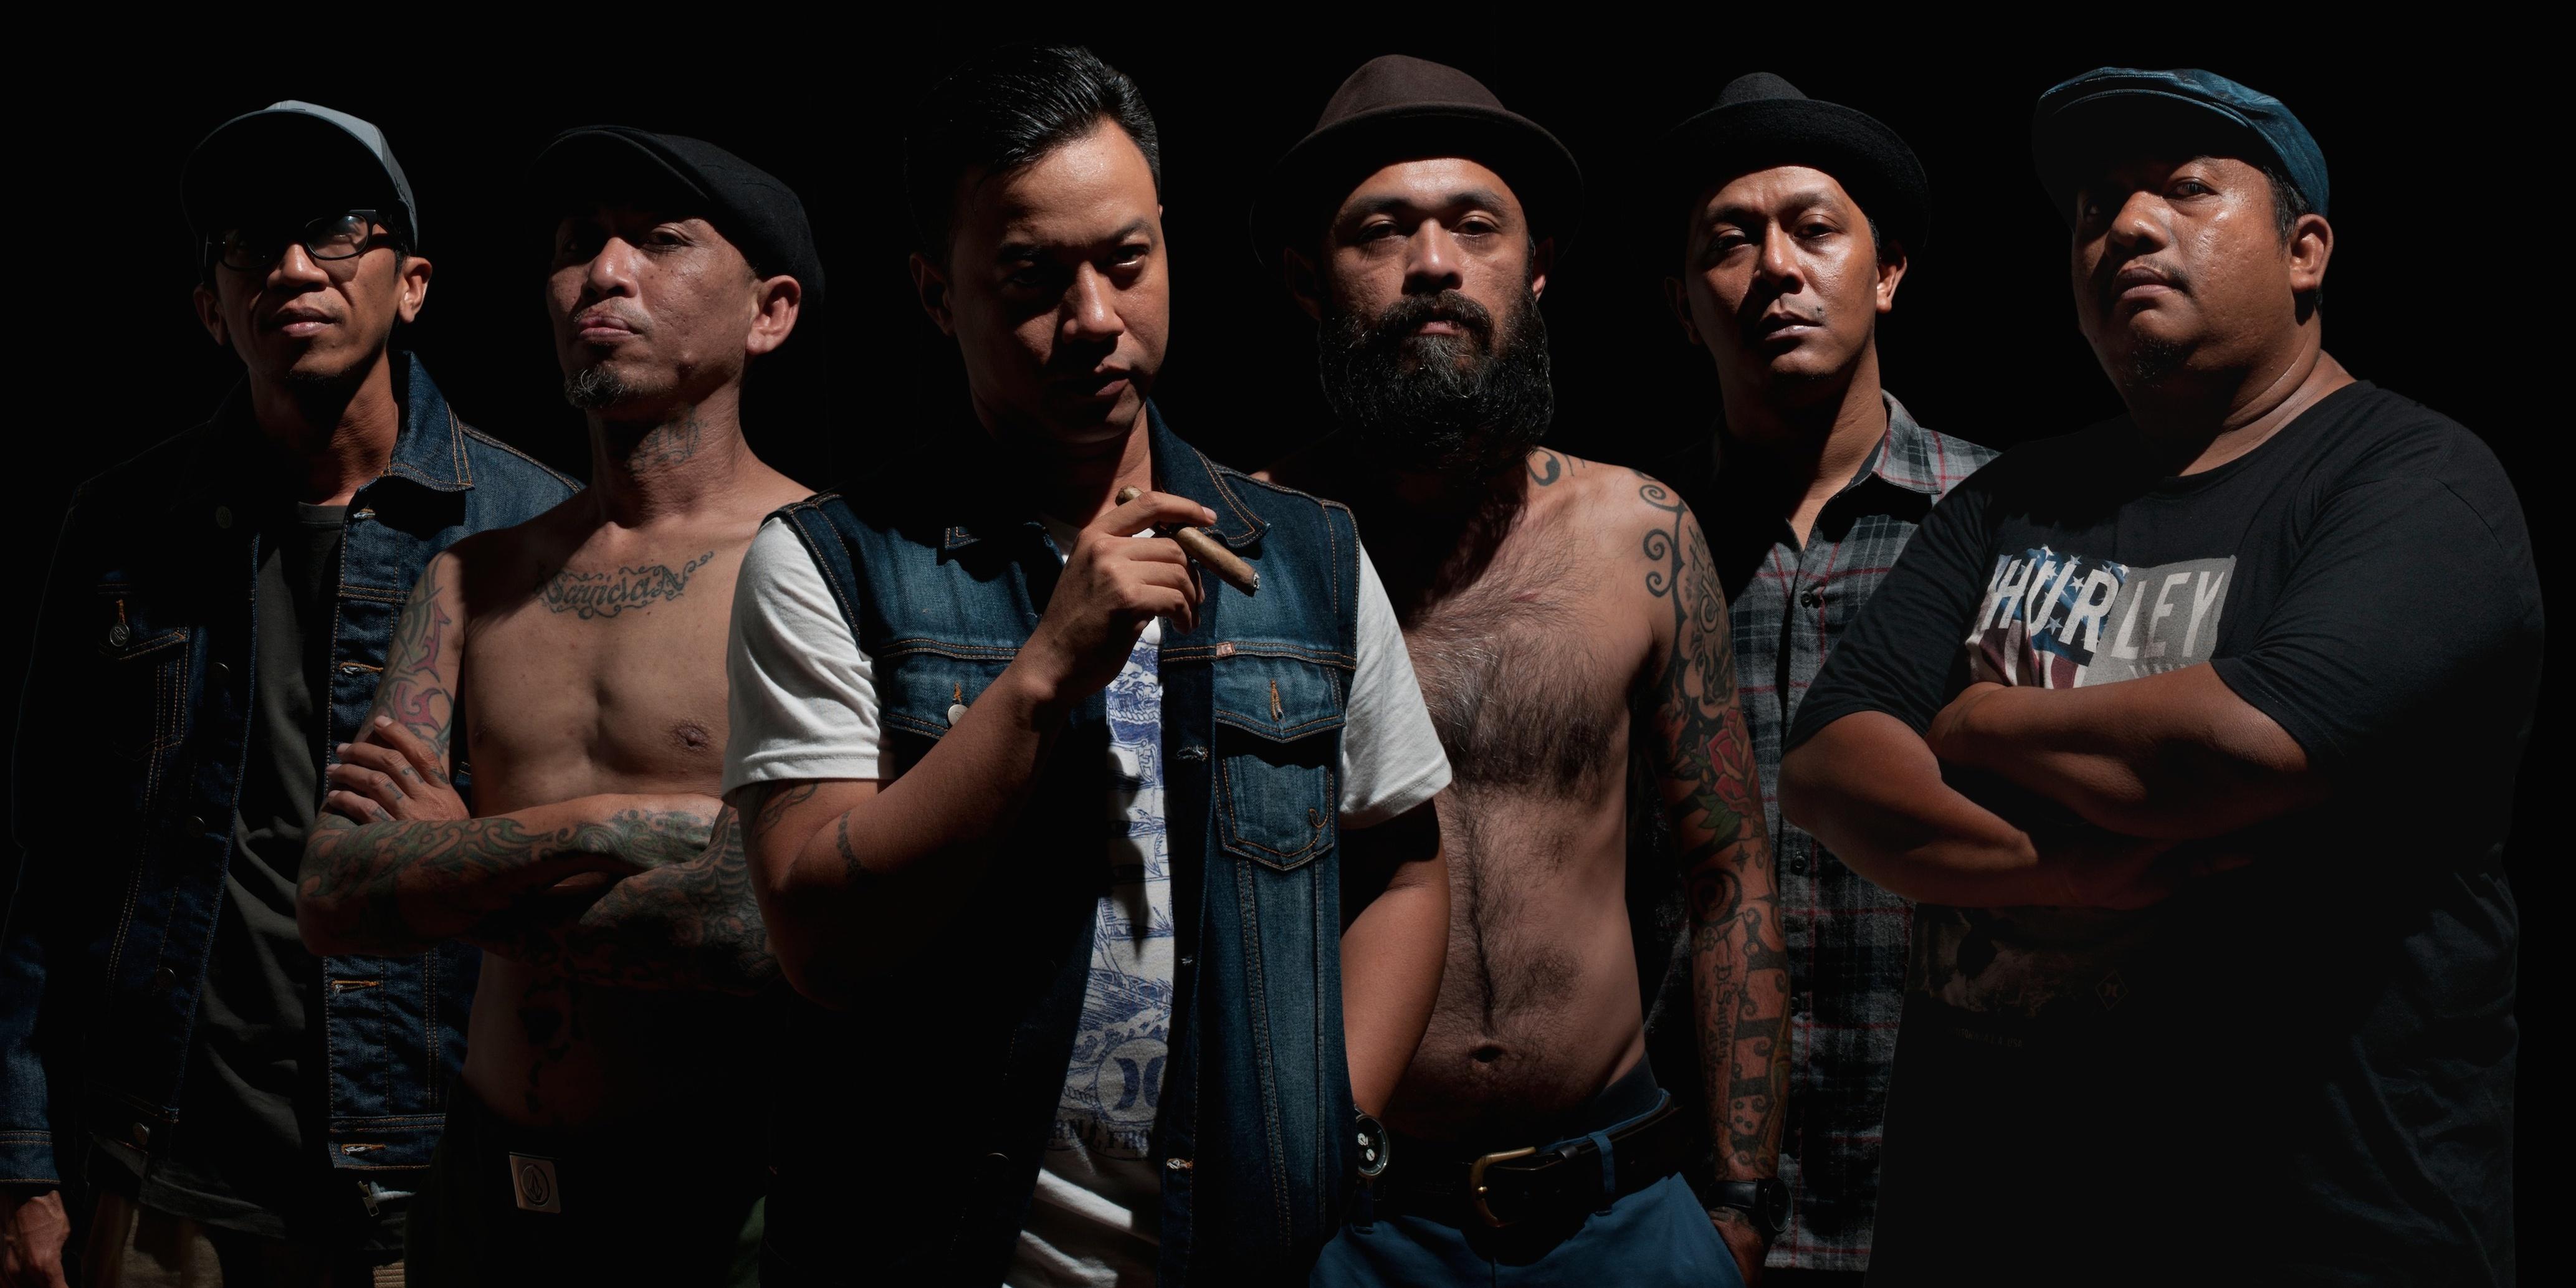 Indonesian ska band Shaggydog releases album 'Putra Nusantara' on vinyl